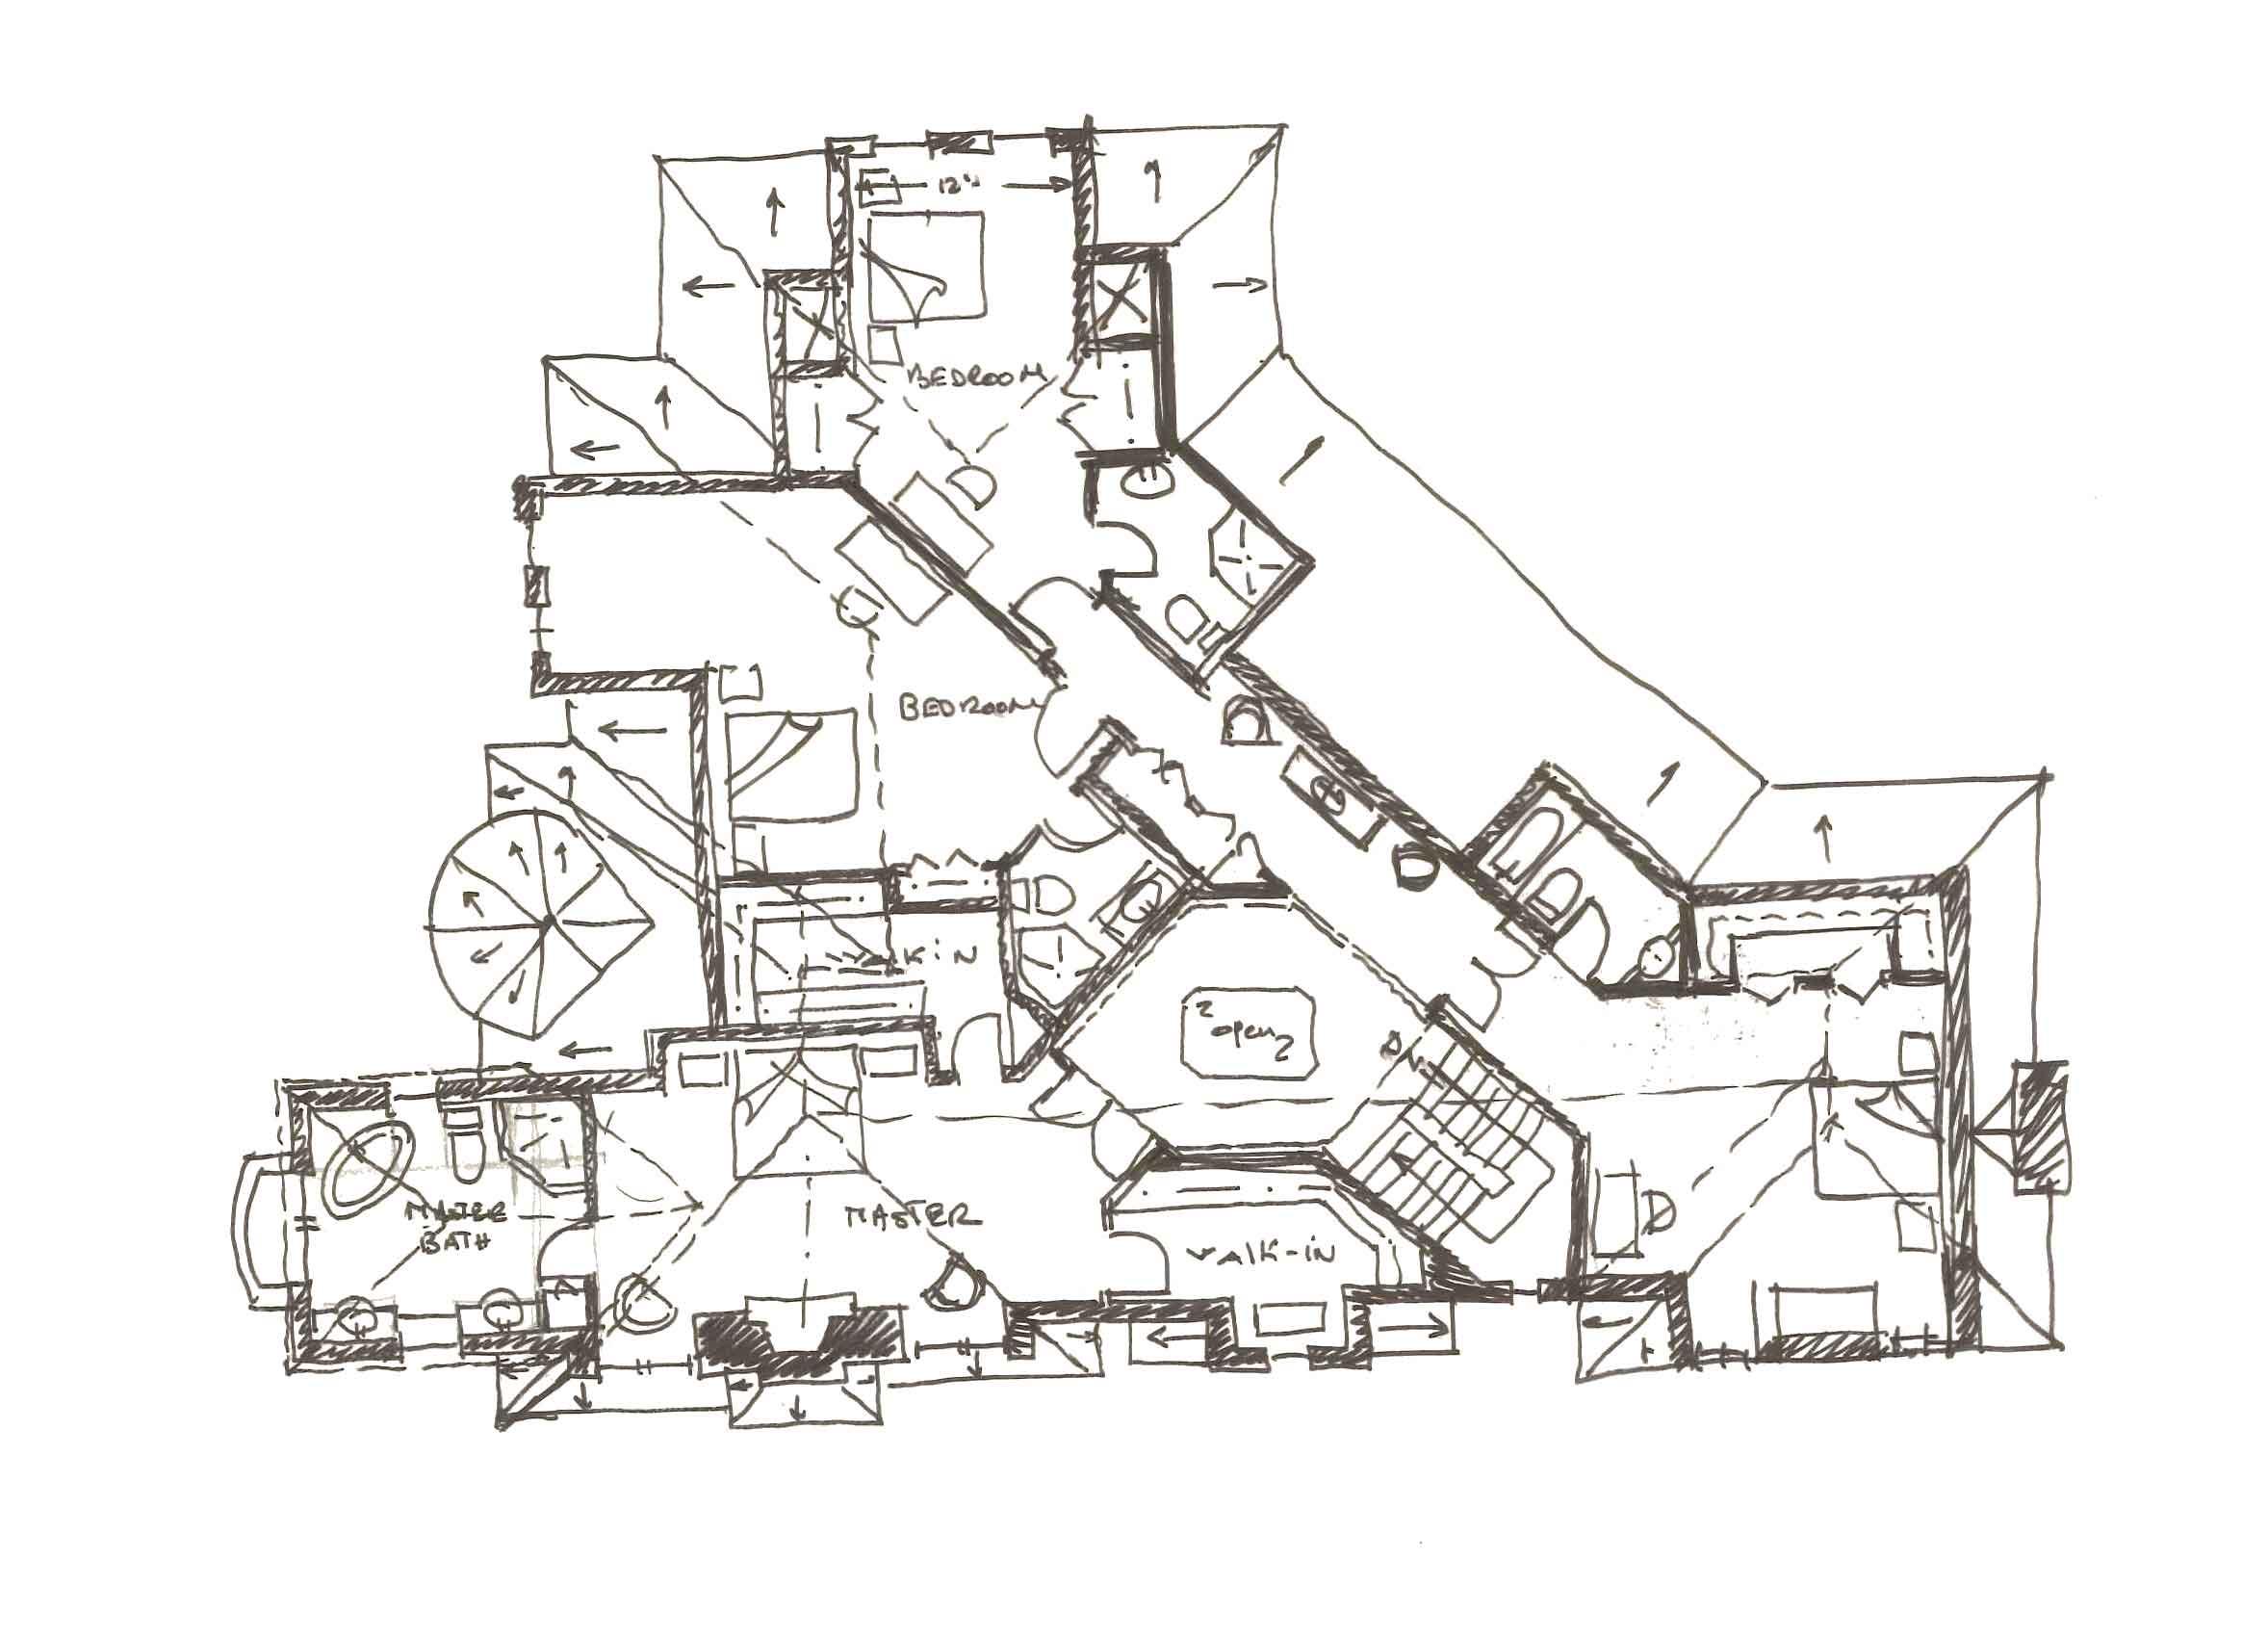 plan_sketch